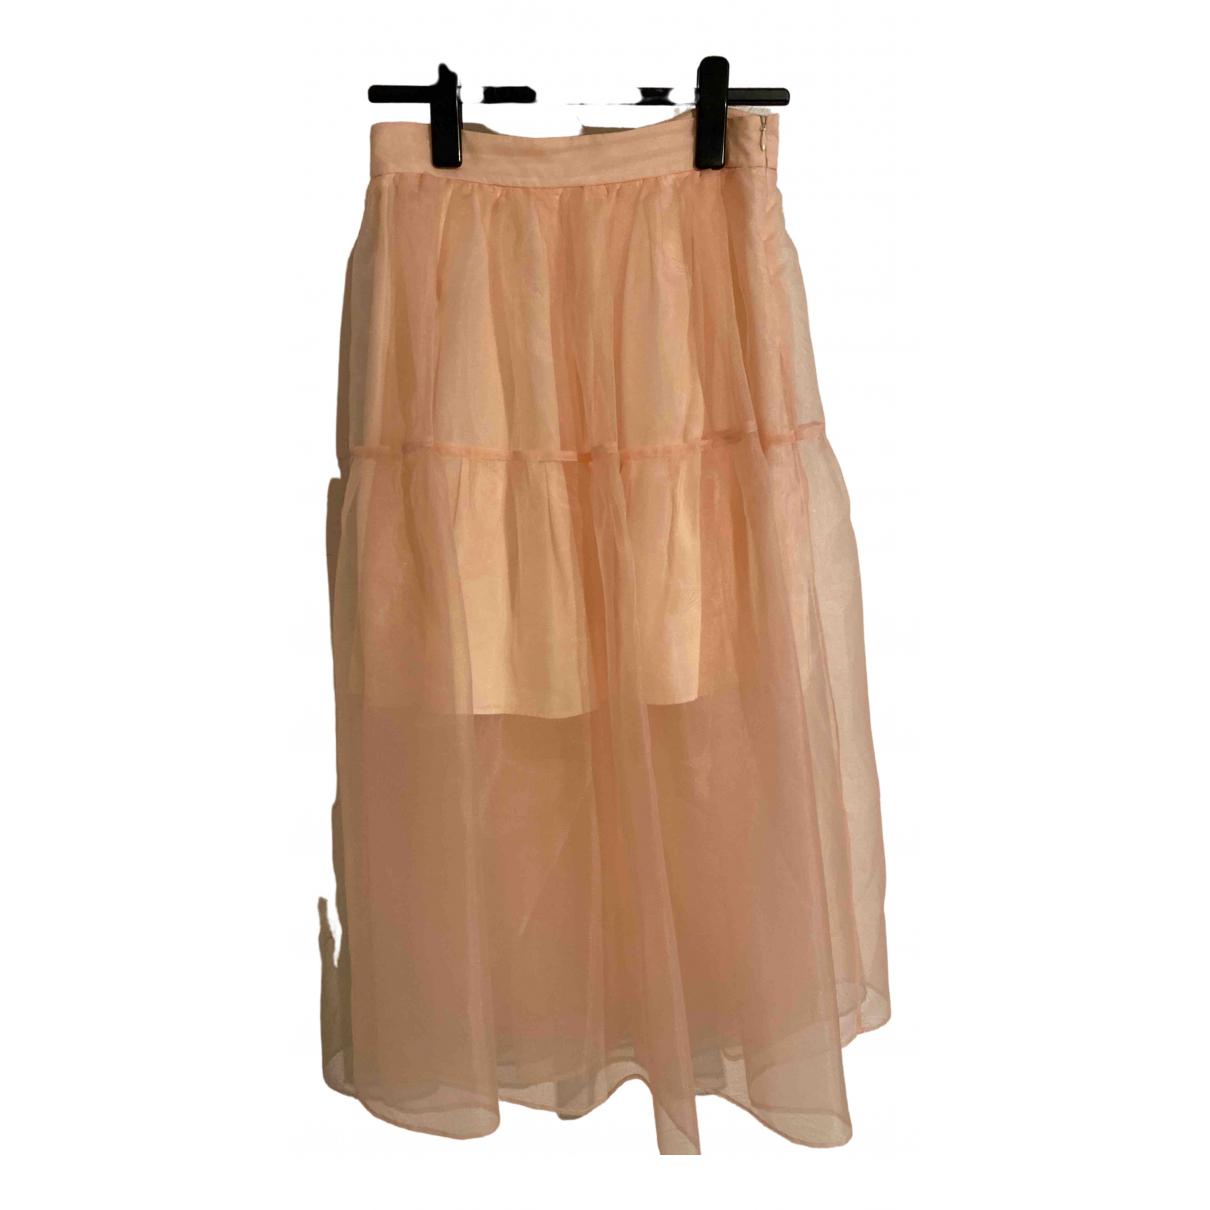 Maje Spring Summer 2019 Pink skirt for Women 40 FR